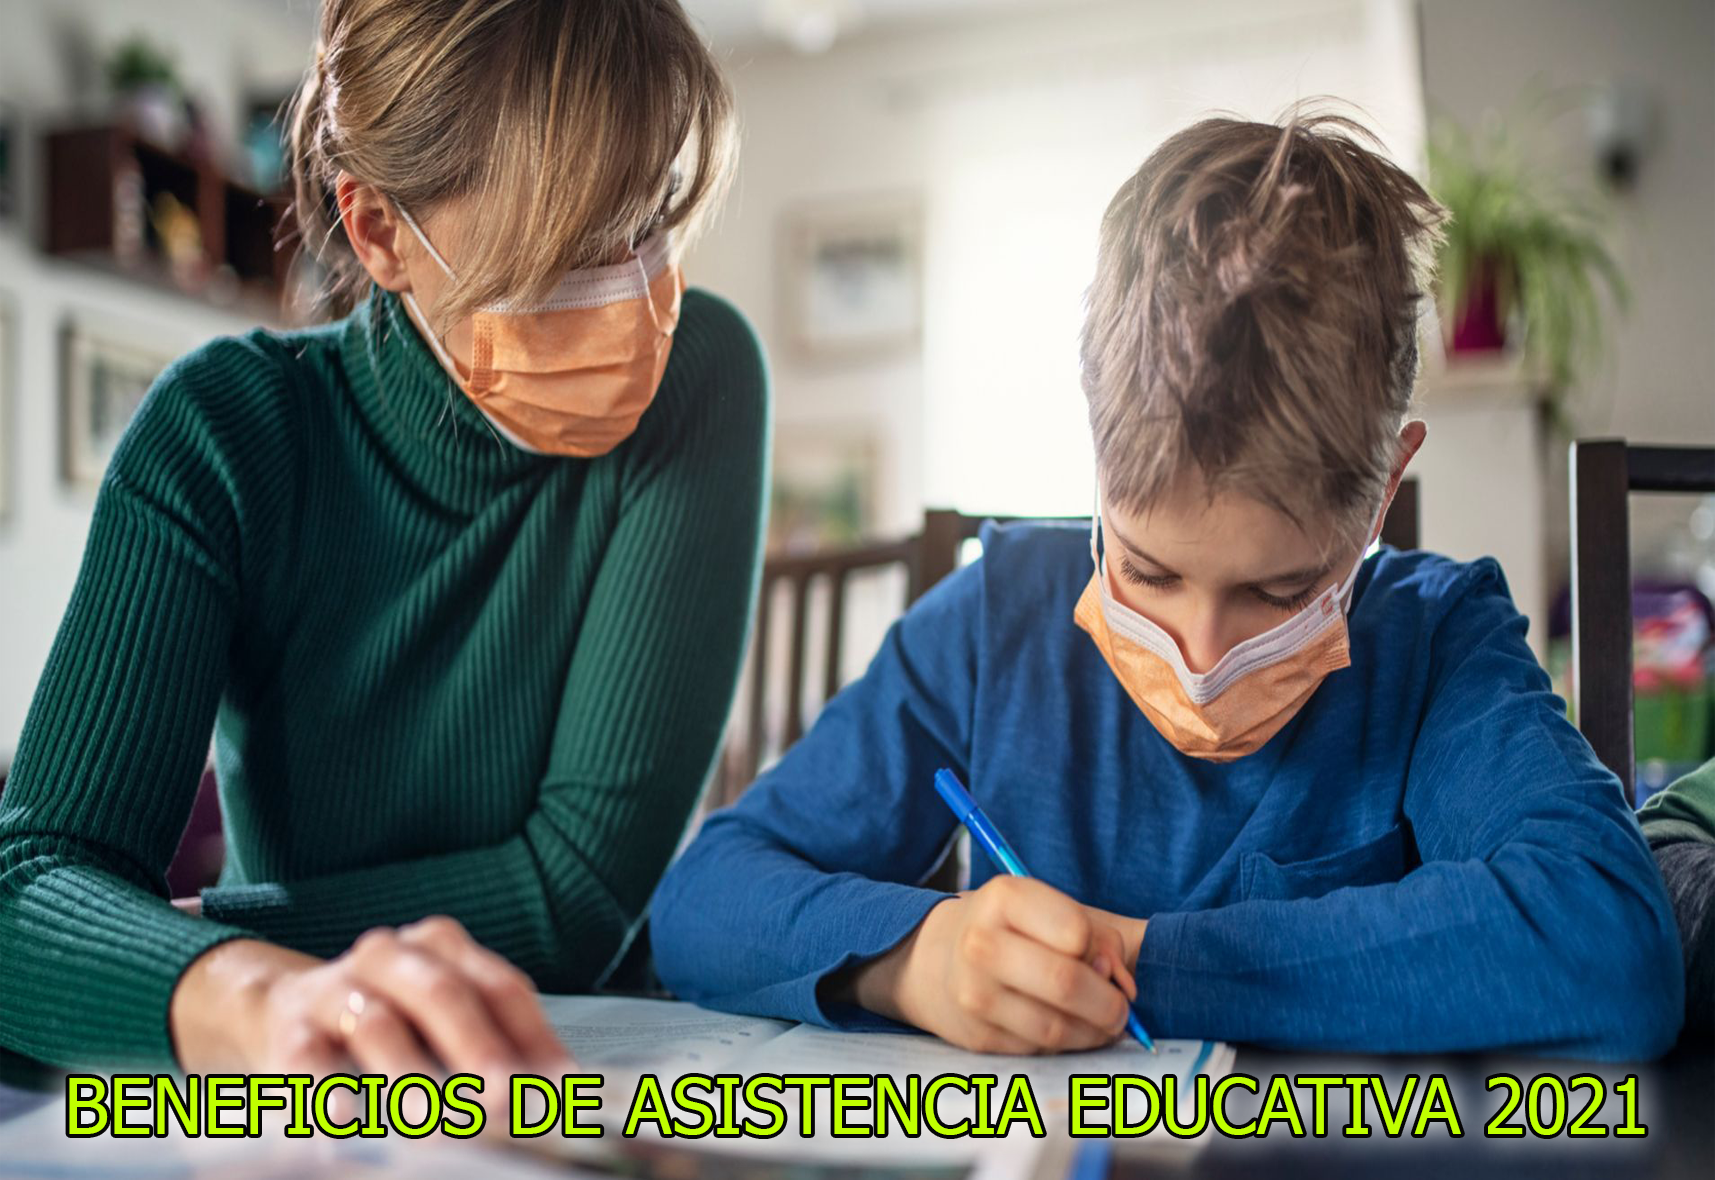 Asistencia Educativa 2021